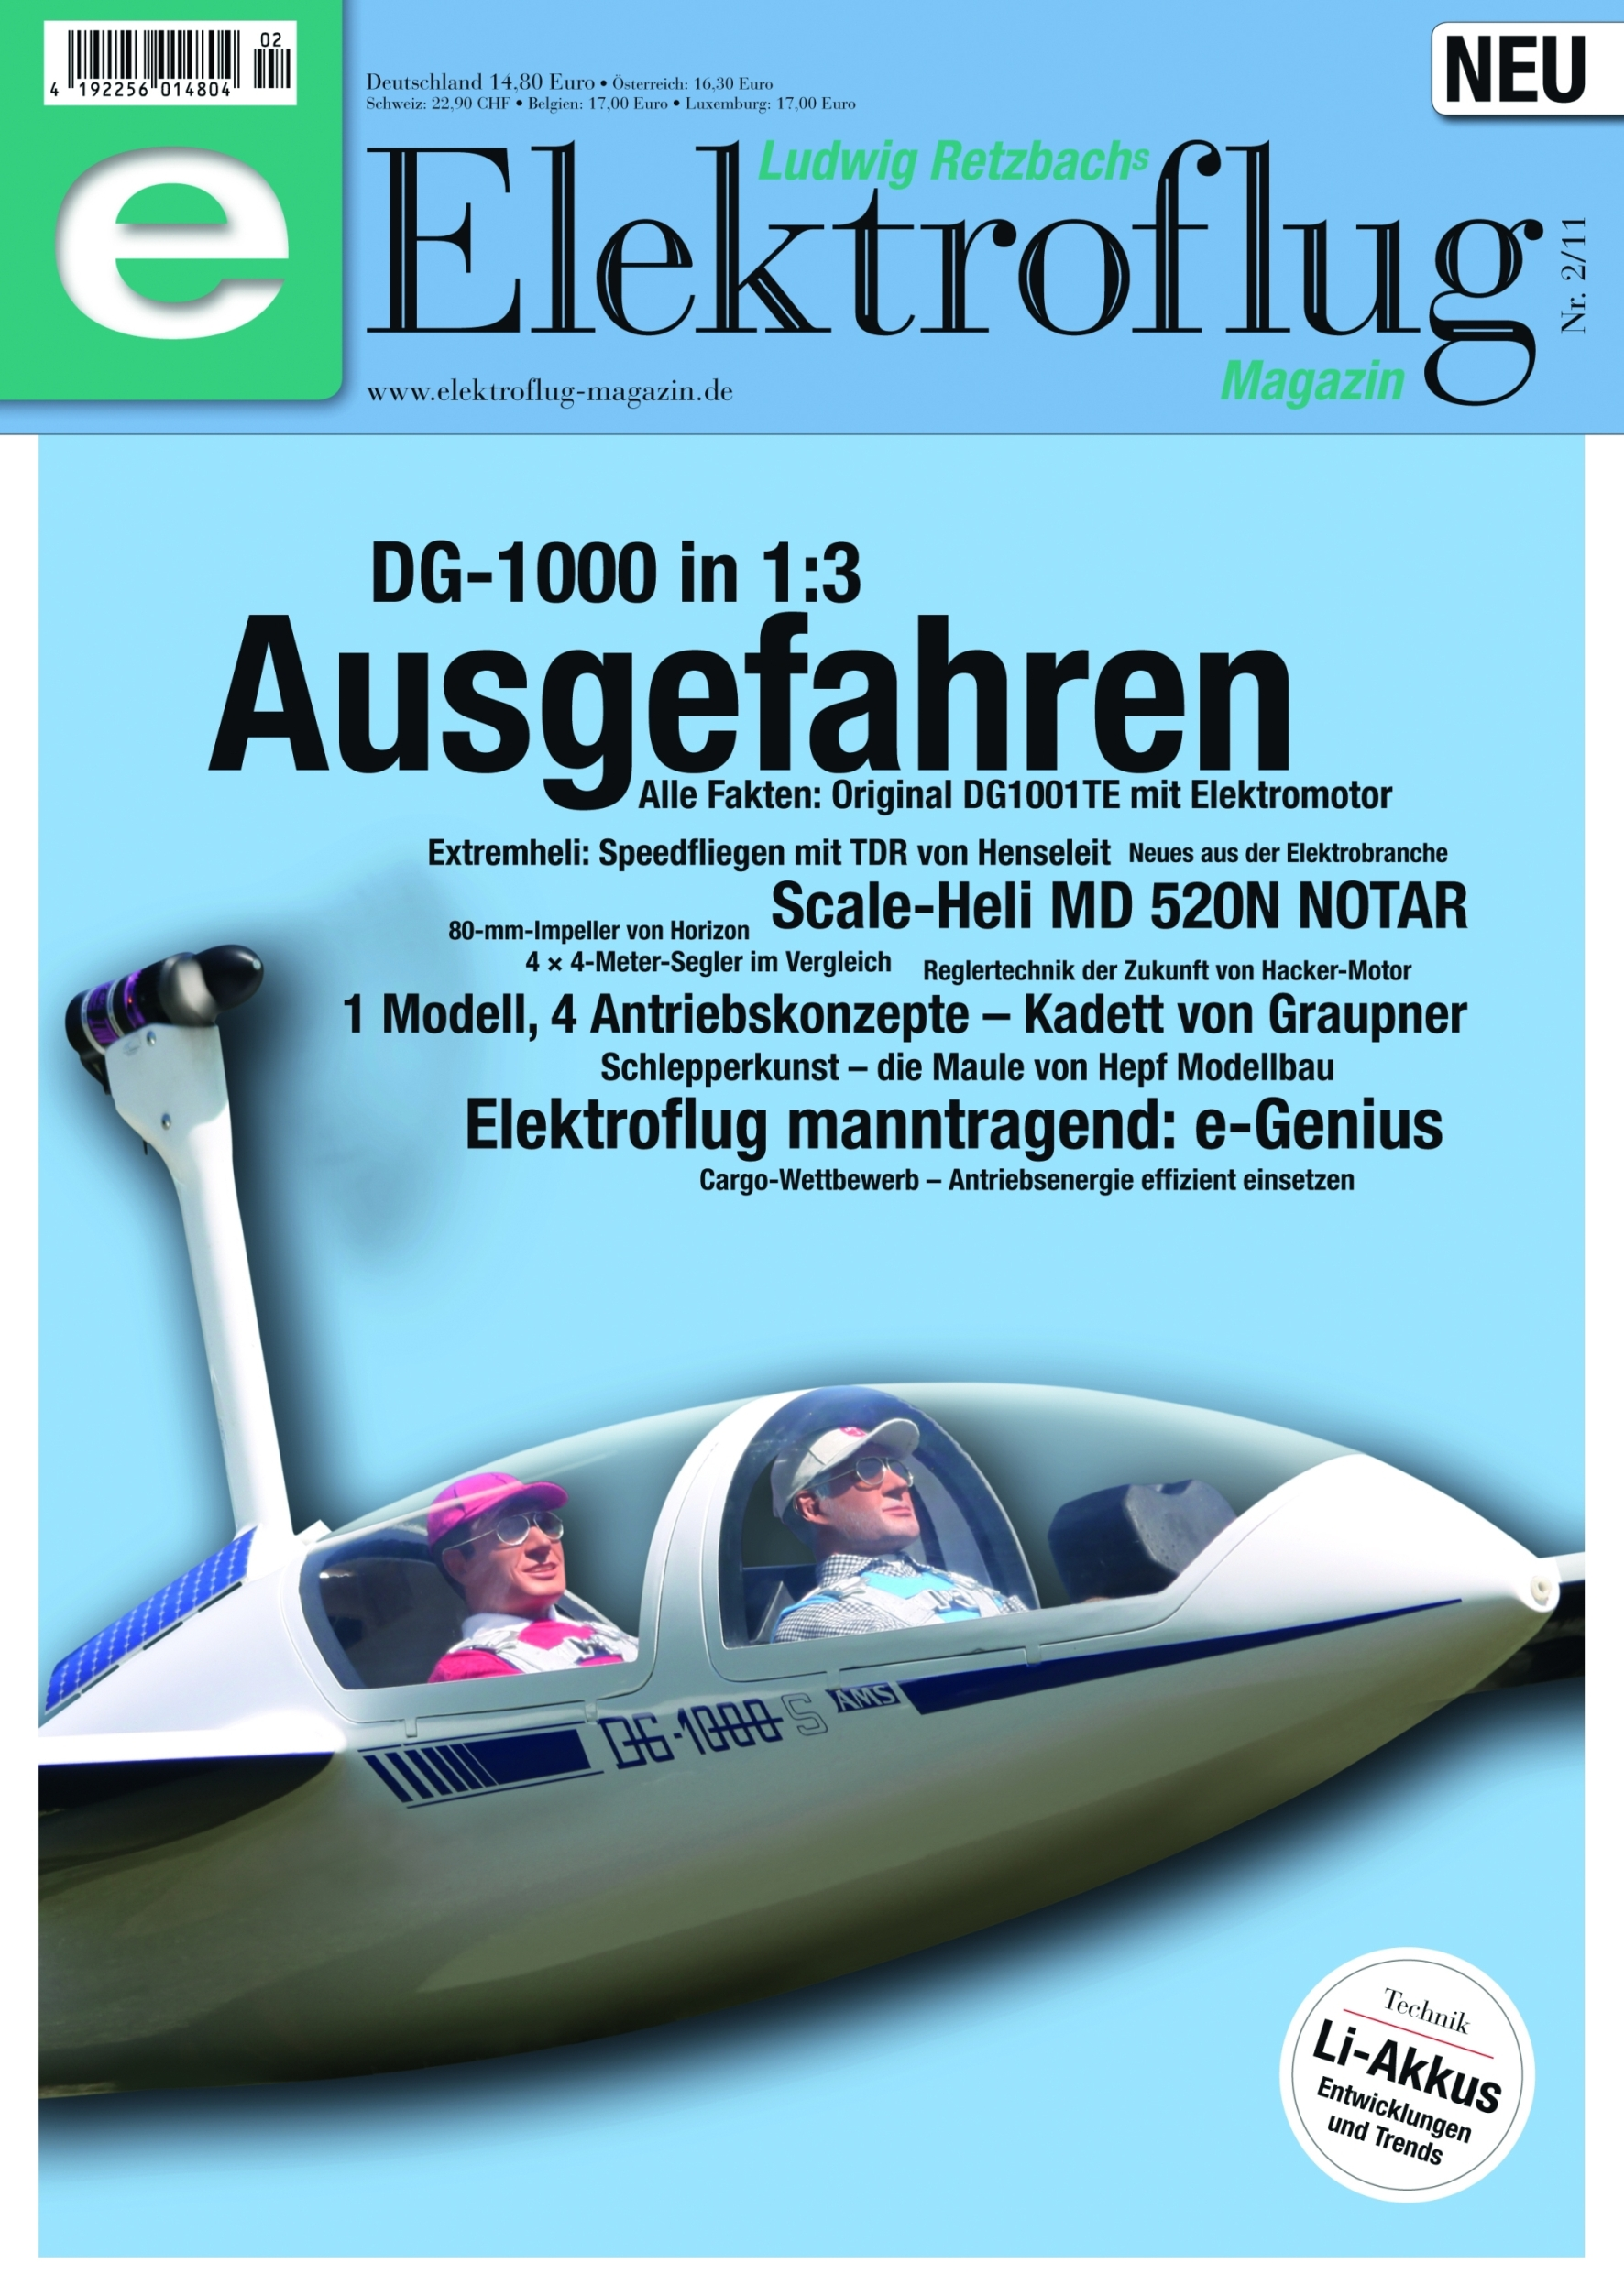 Elektroflug-Magazin 2/2011